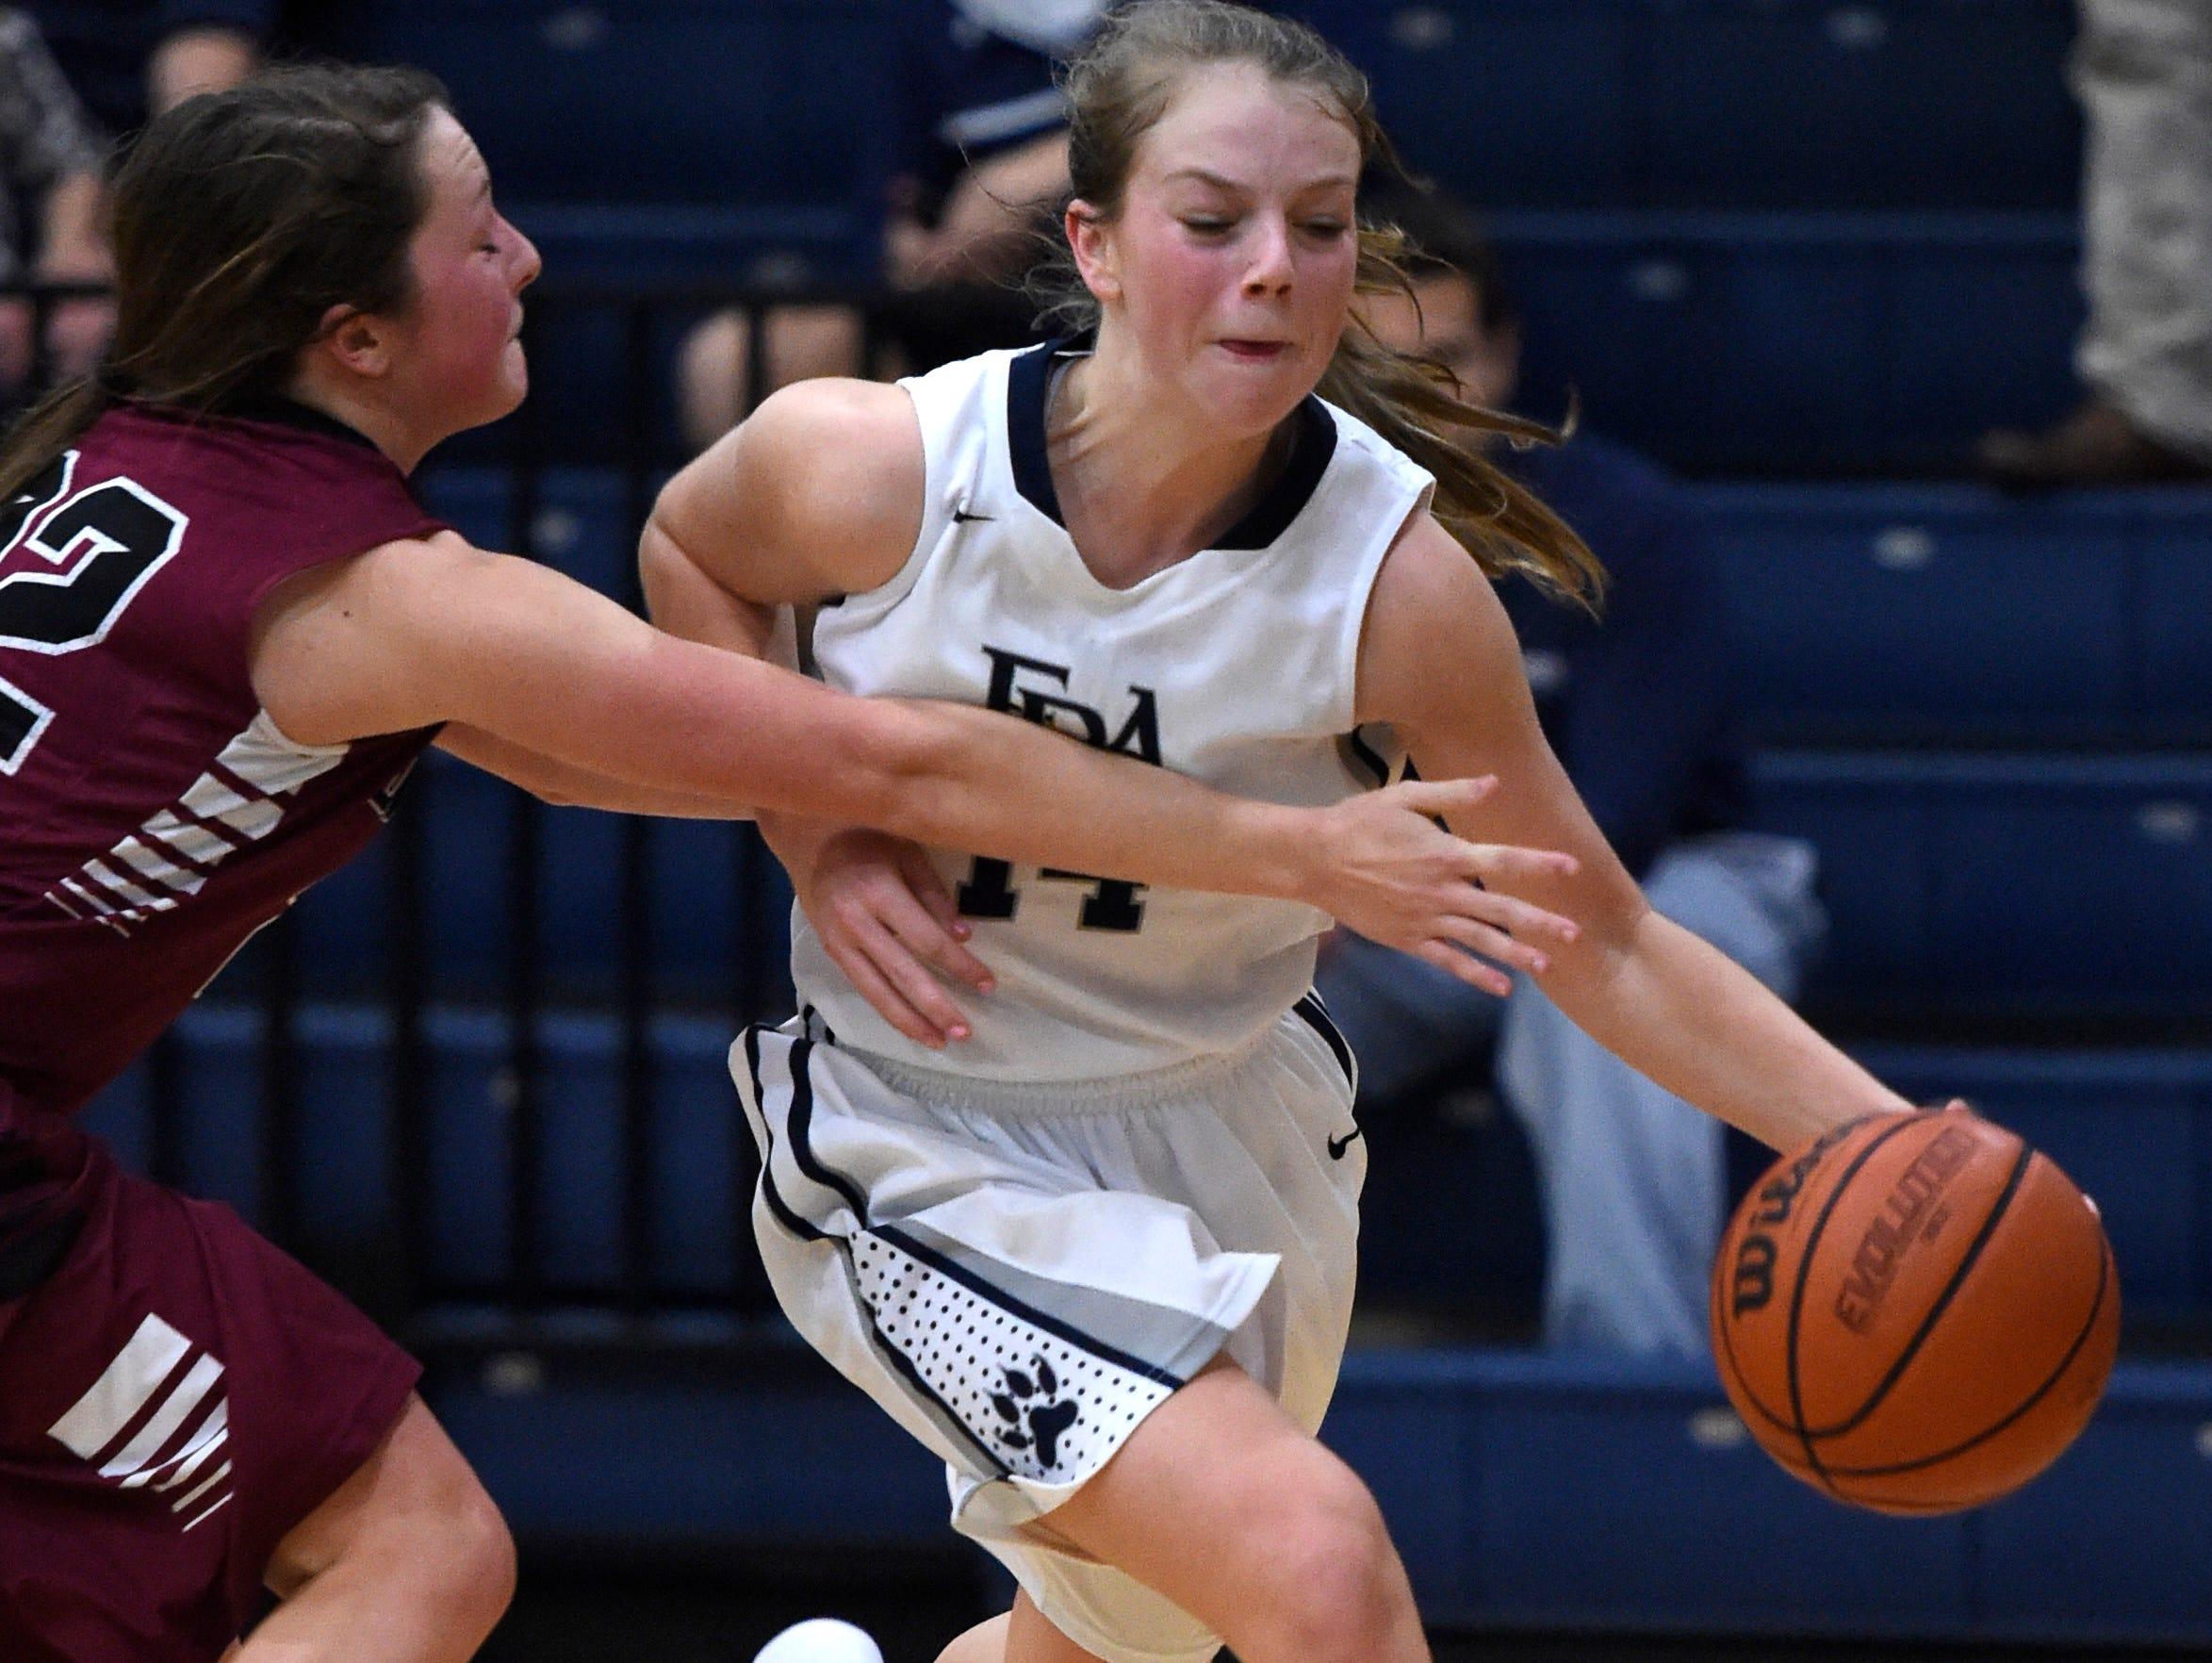 Davidson Academy's Davis Smith (22) fouls FRA's Taylor Casey as she drives to the basket on Jan. 8, 2016.